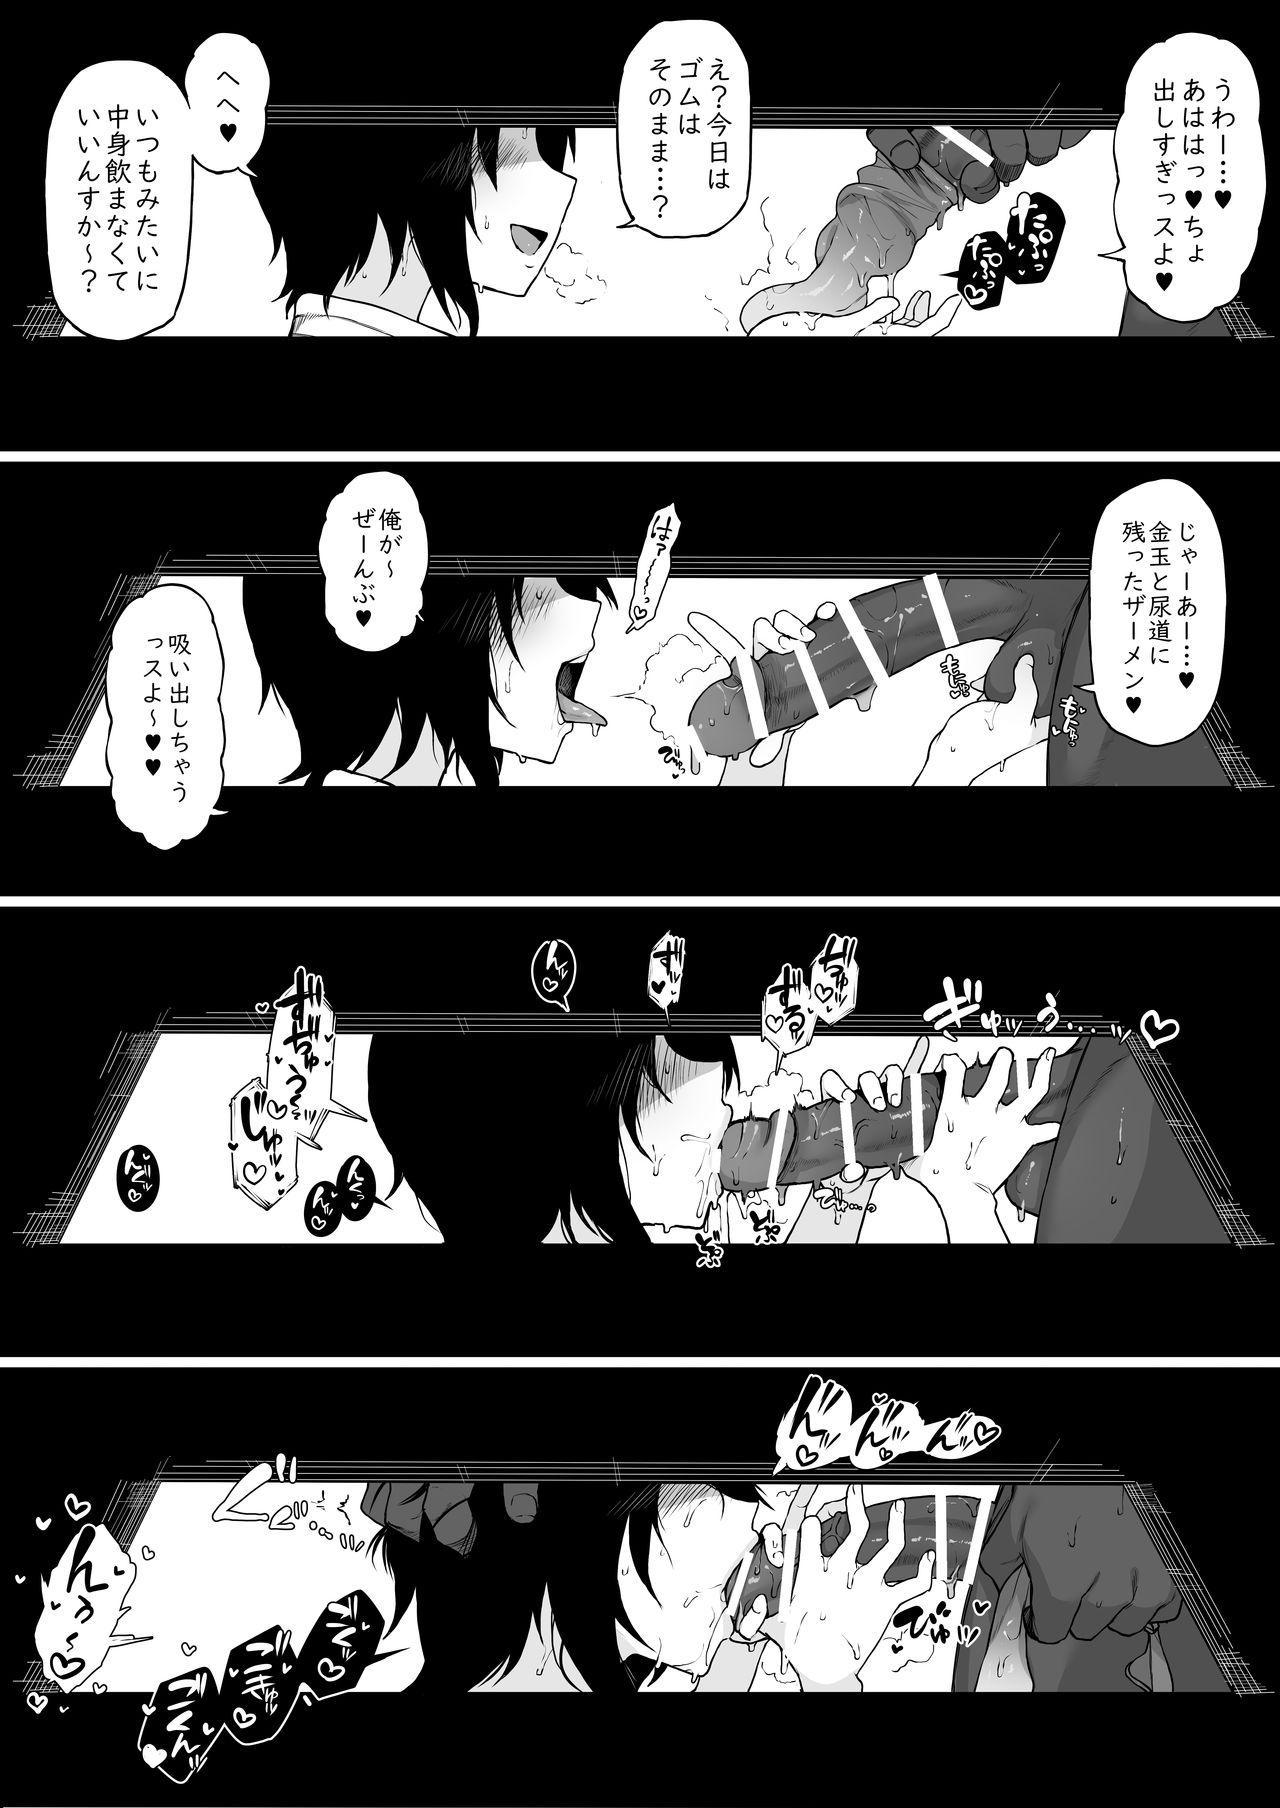 [Terasu MC] Kokujin no Tenkousei NTR ru (5) Kouhai o NTR ru 13